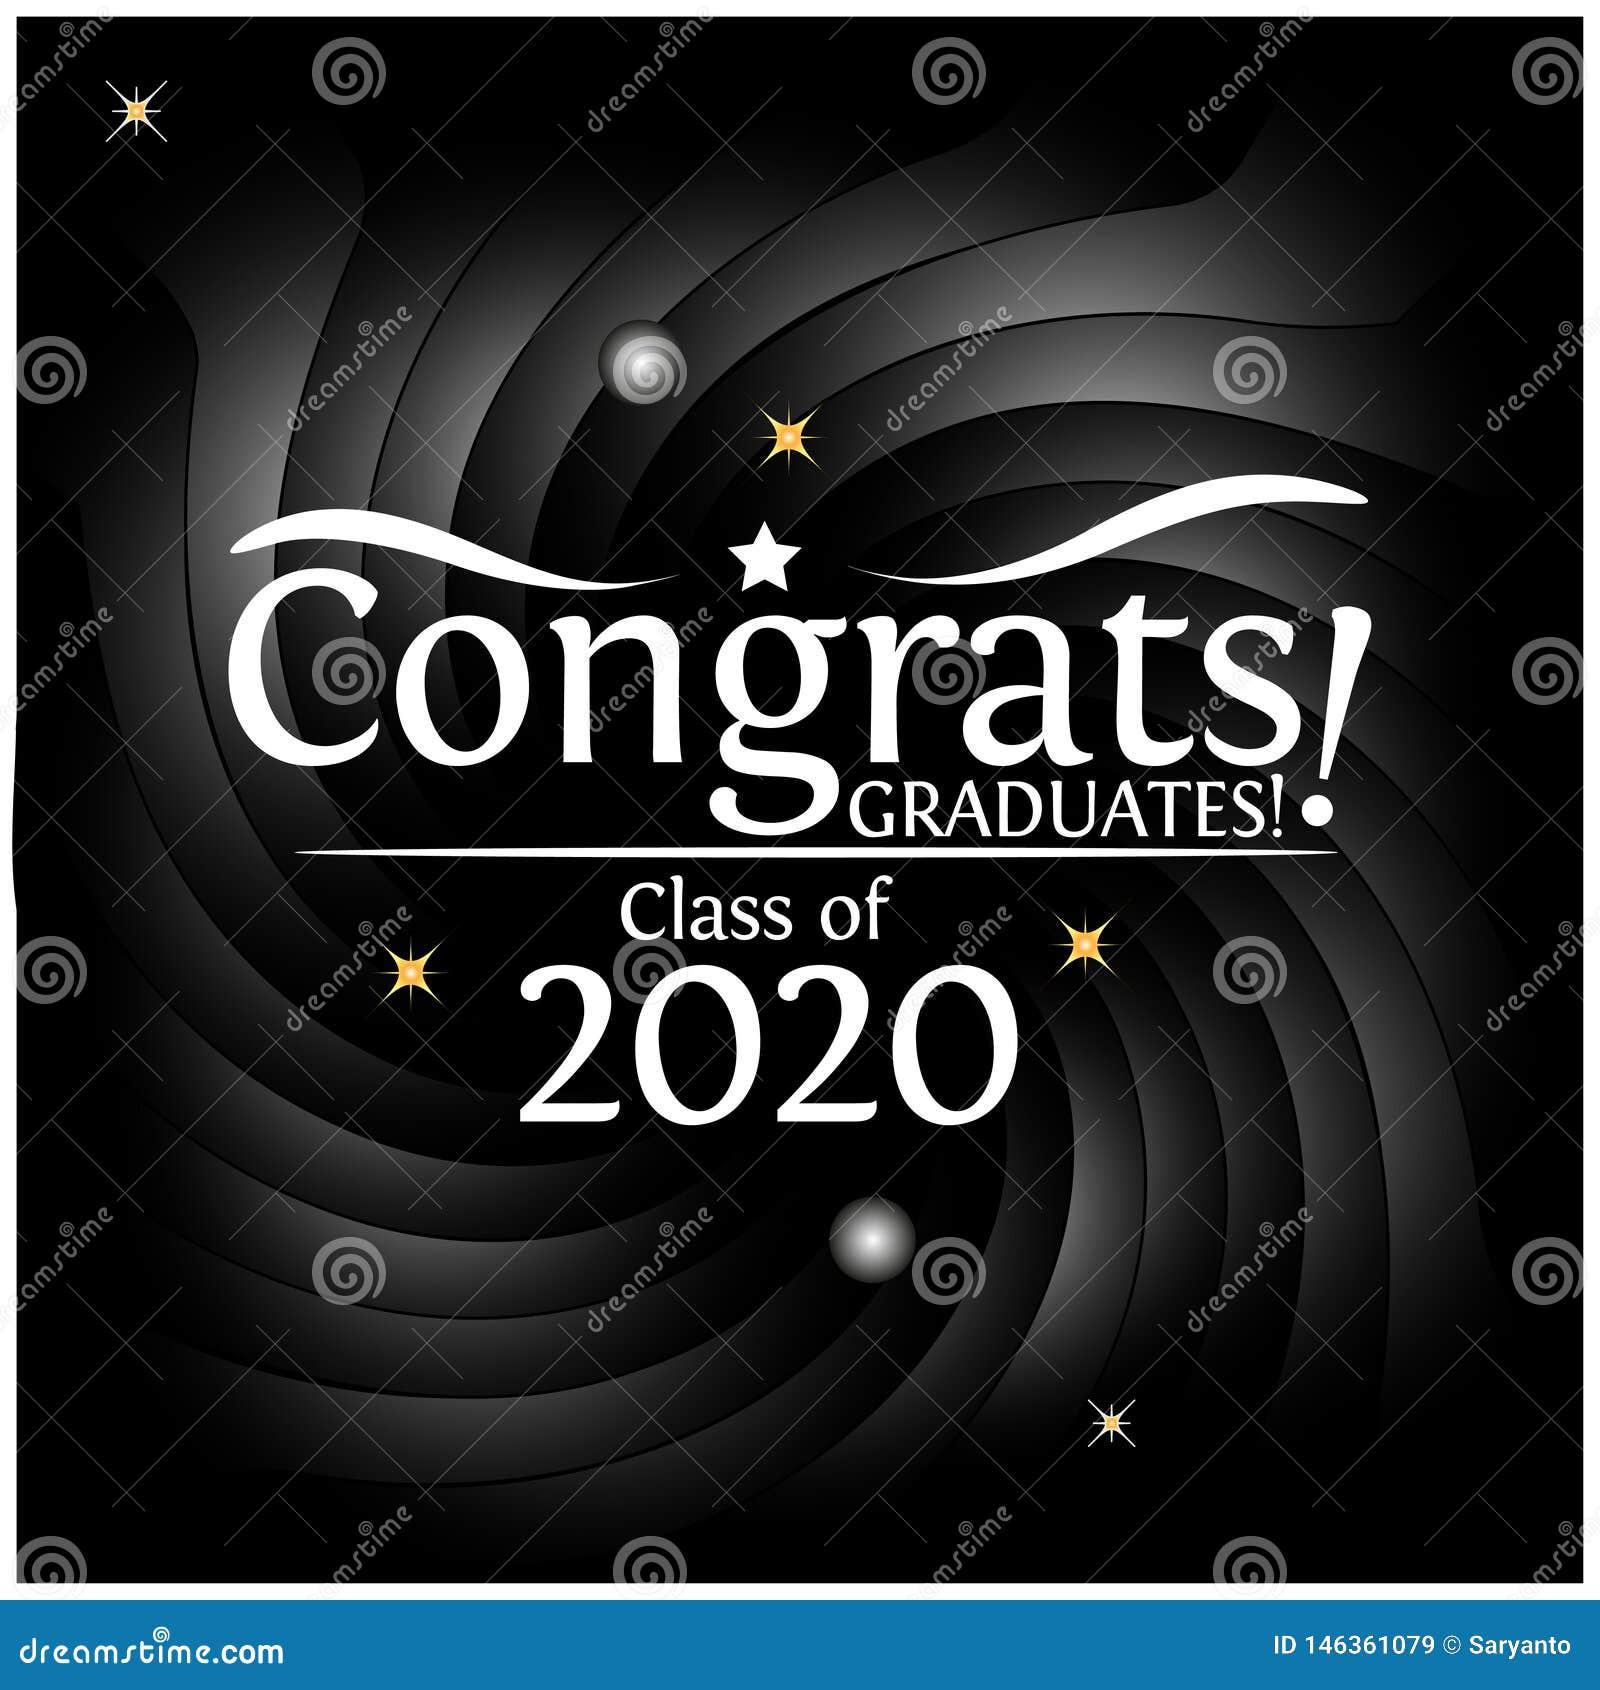 Graduation Background 2020.Congrats On Graduation Class Of 2020 On Black Background